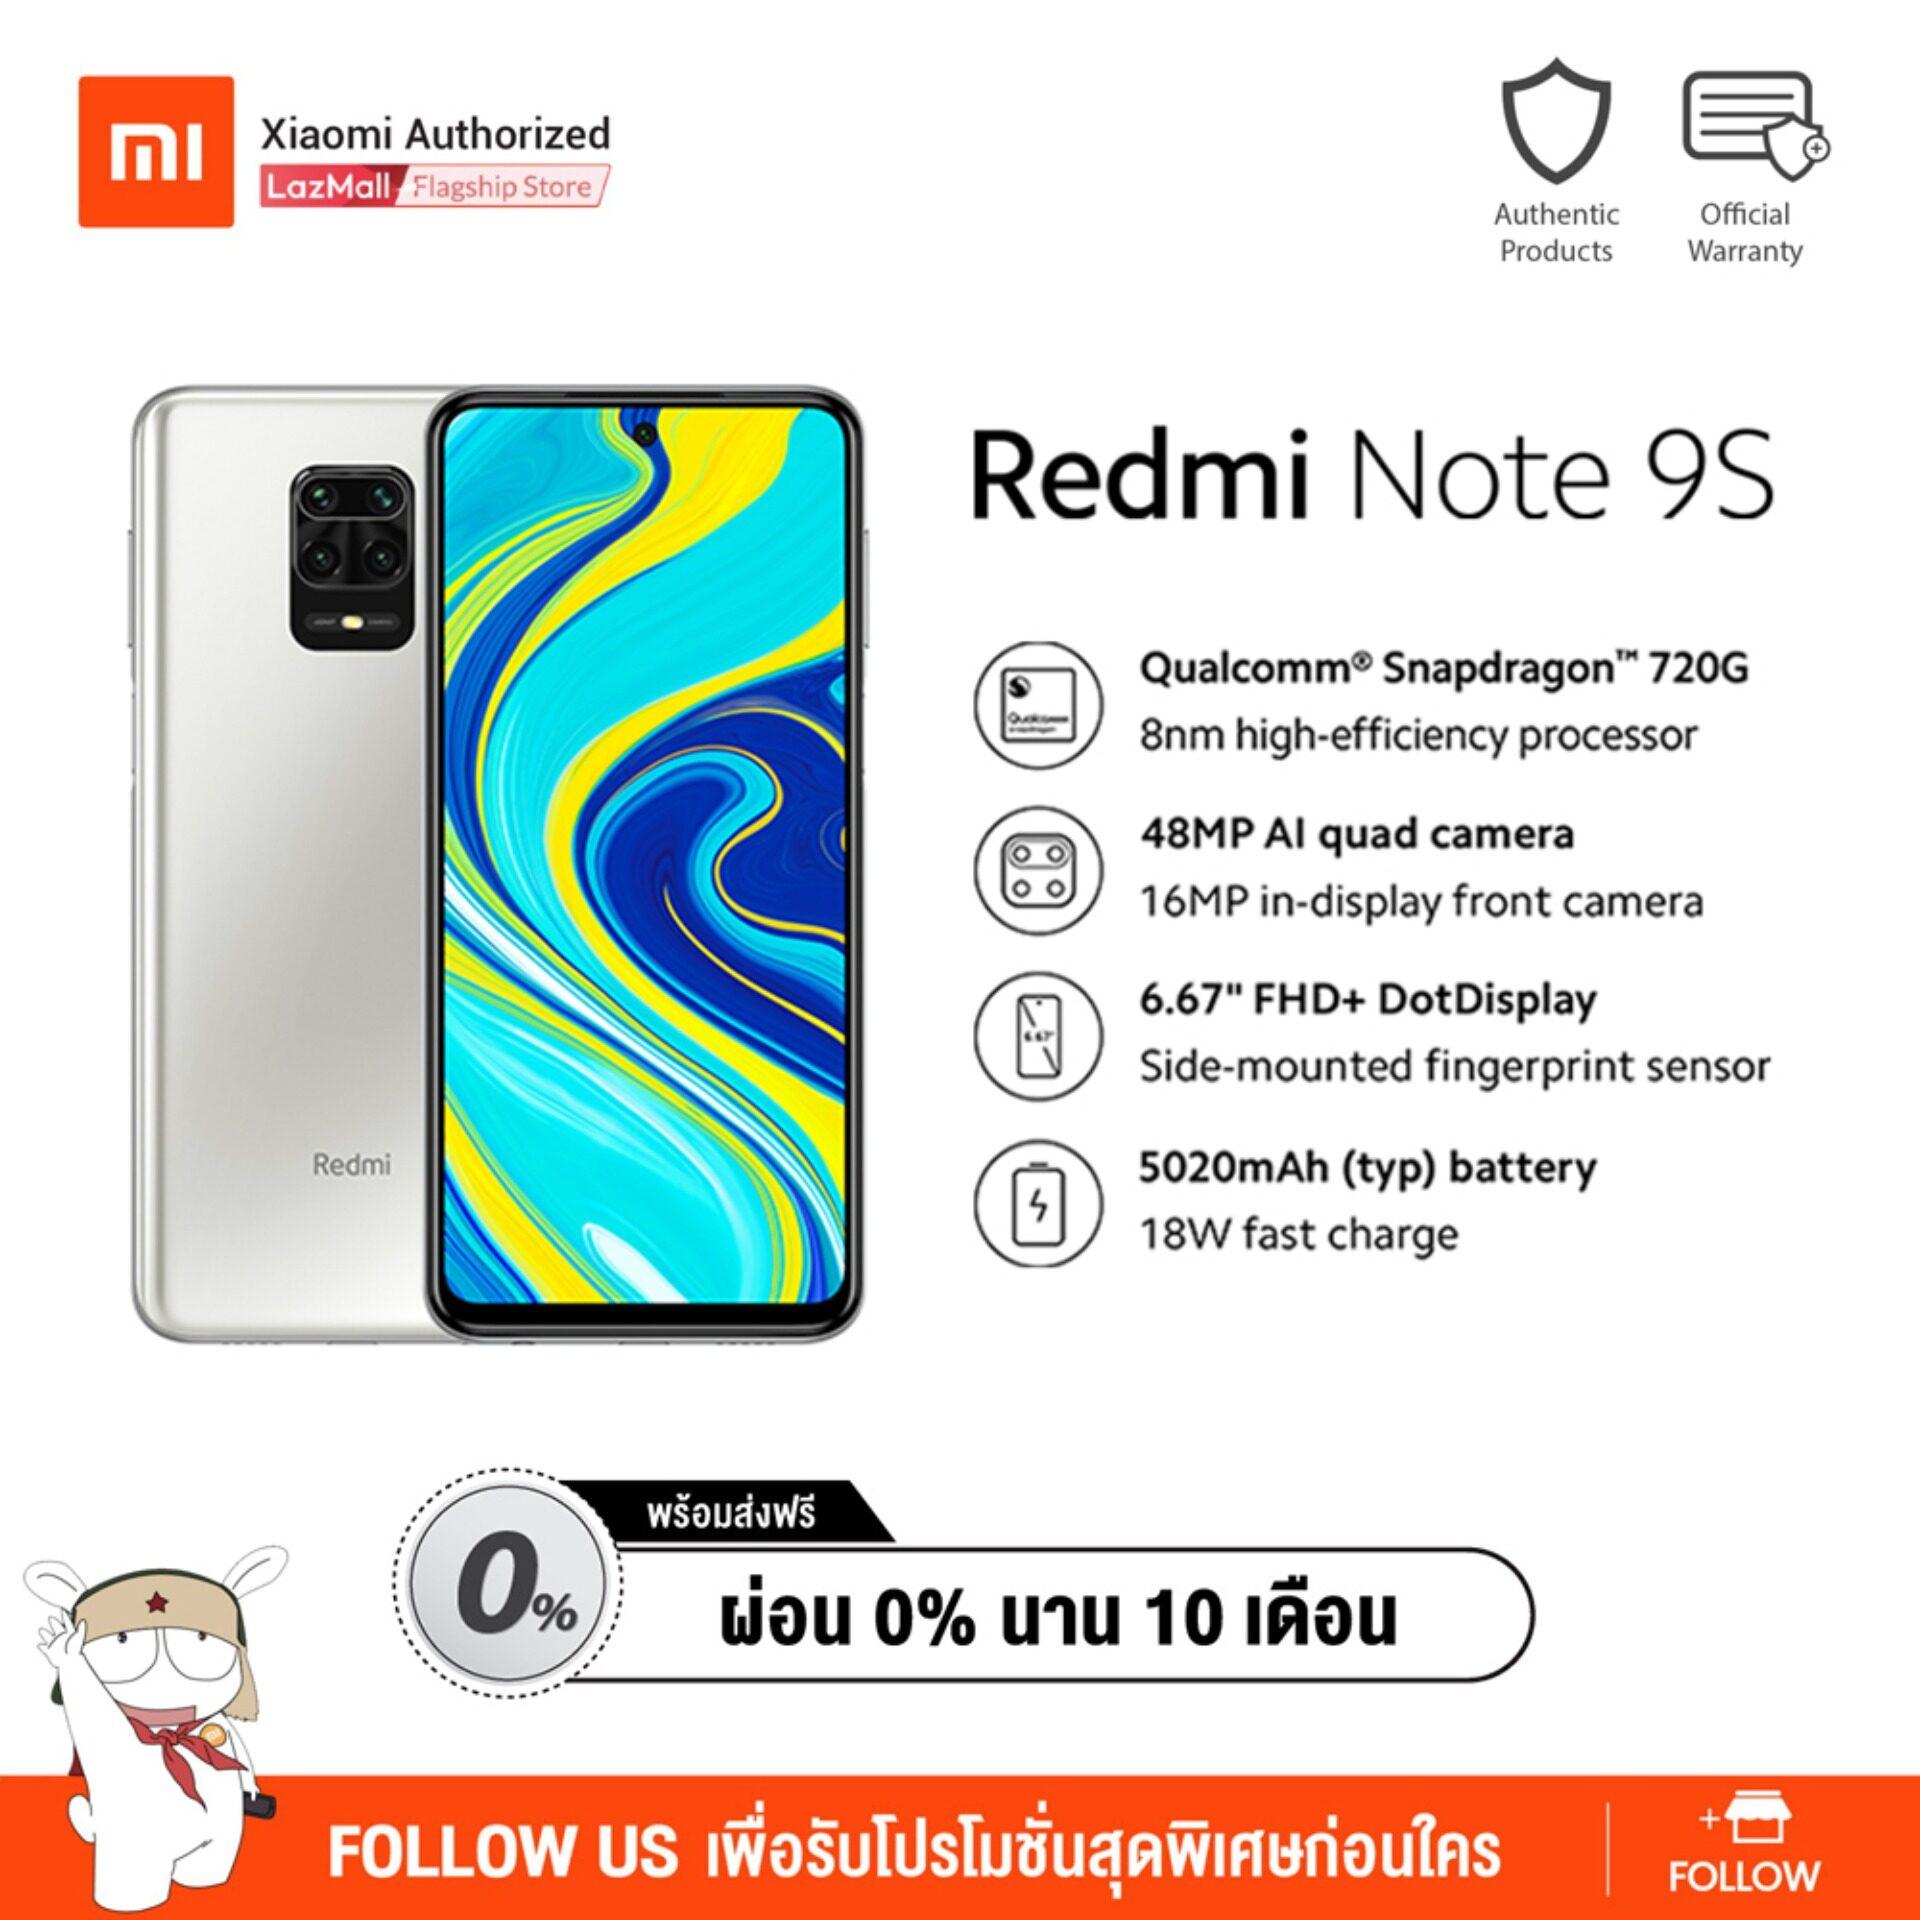 Redmi Note 9S 4GB+64GB สมาร์ทโฟน Snapdragon™ 720G Superb 48MP AI quad camera แบตเตอรี่ 5020mAh